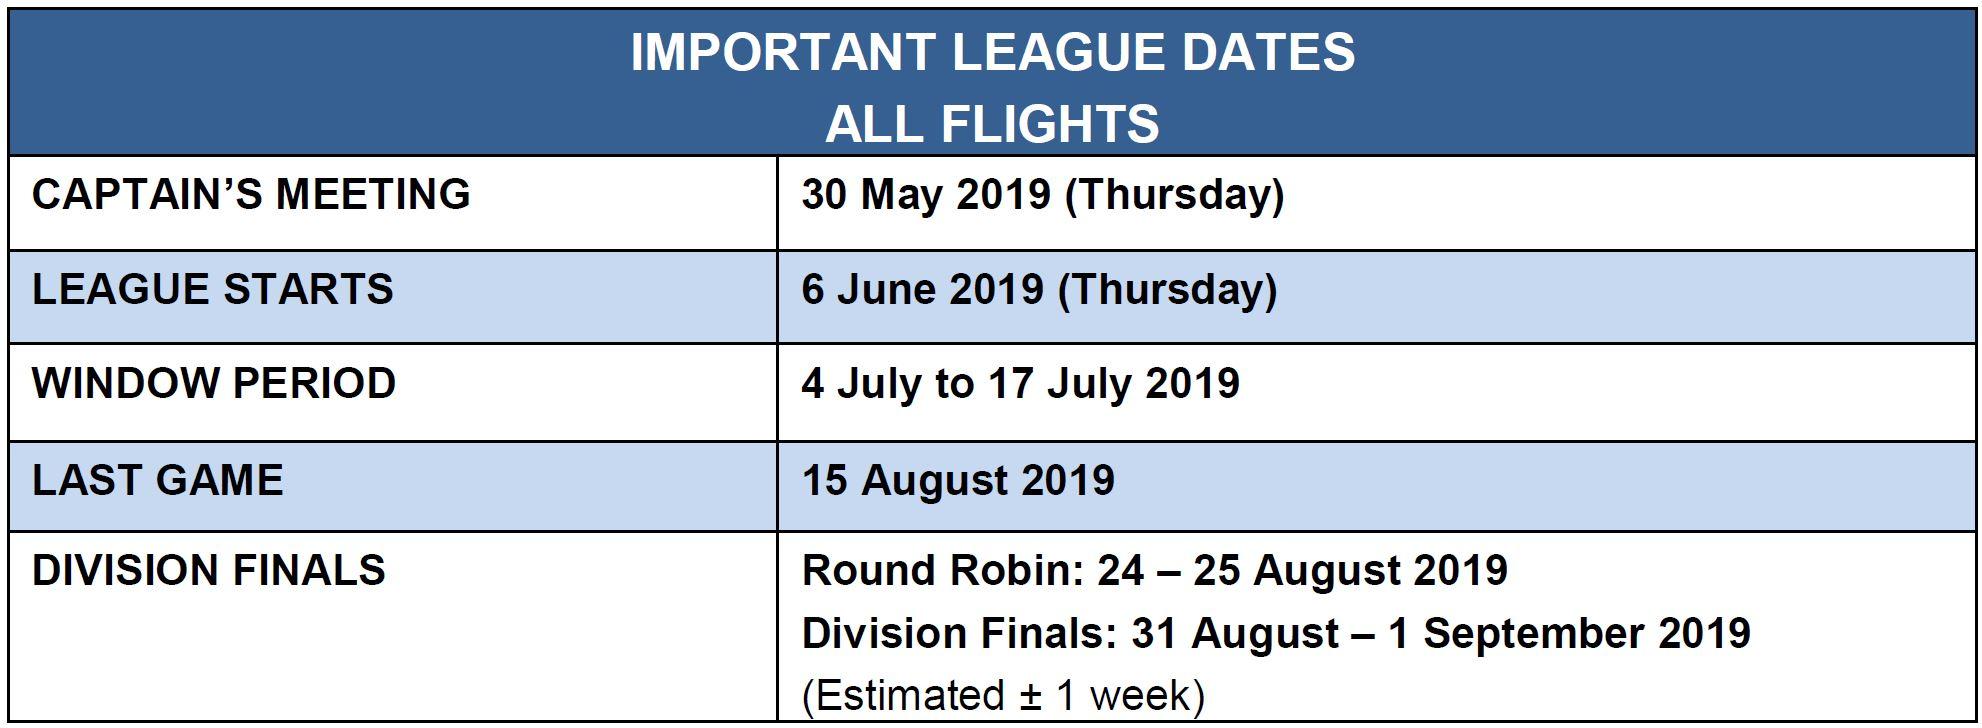 S2S12 important Dates.JPG